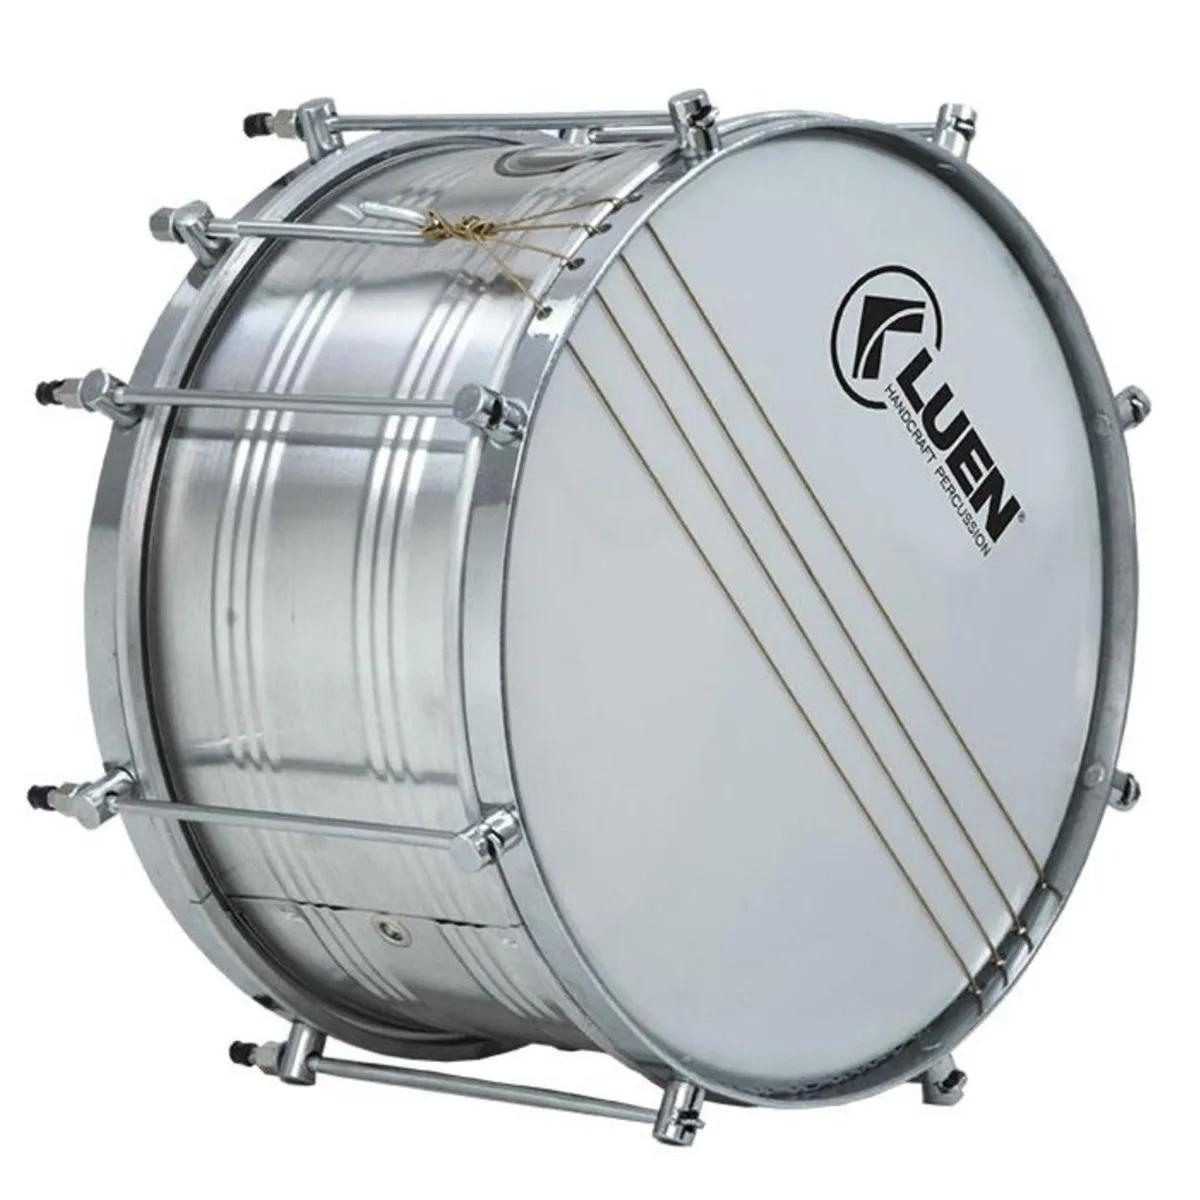 Malacaxeta Luen Percussion 20x12 Alumínio com Pele Leitosa